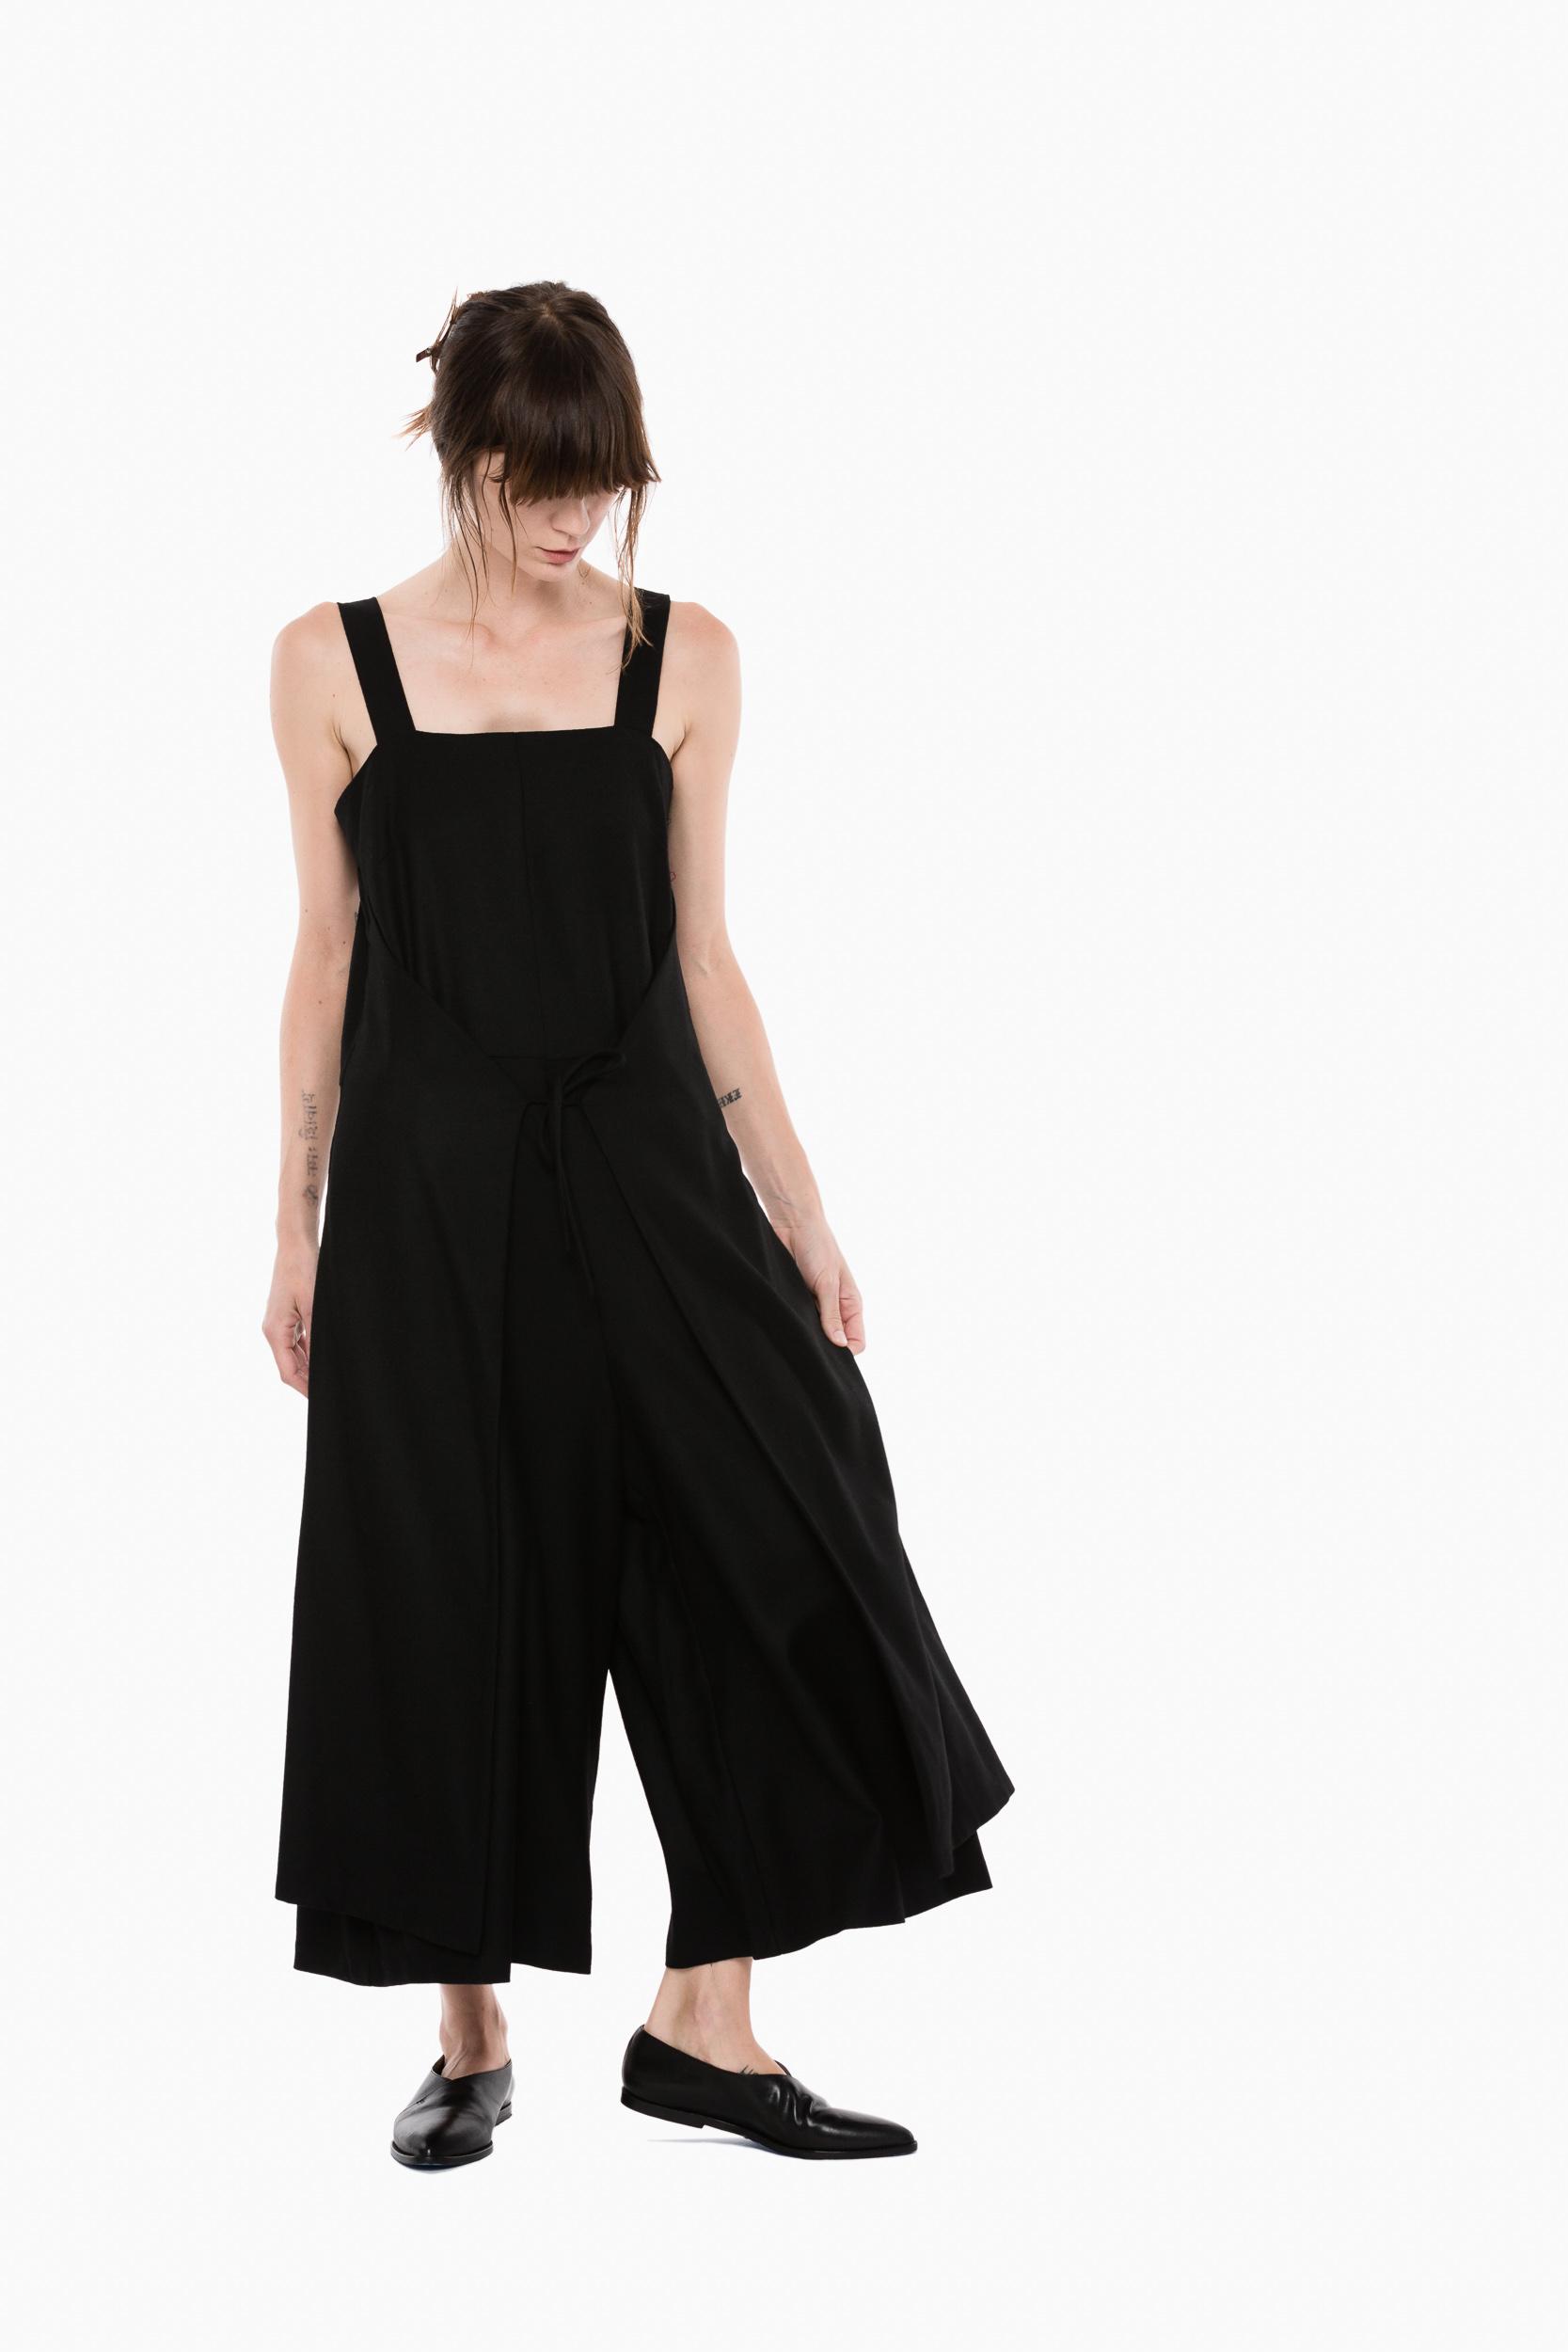 111WT-carol-black--1055.jpg